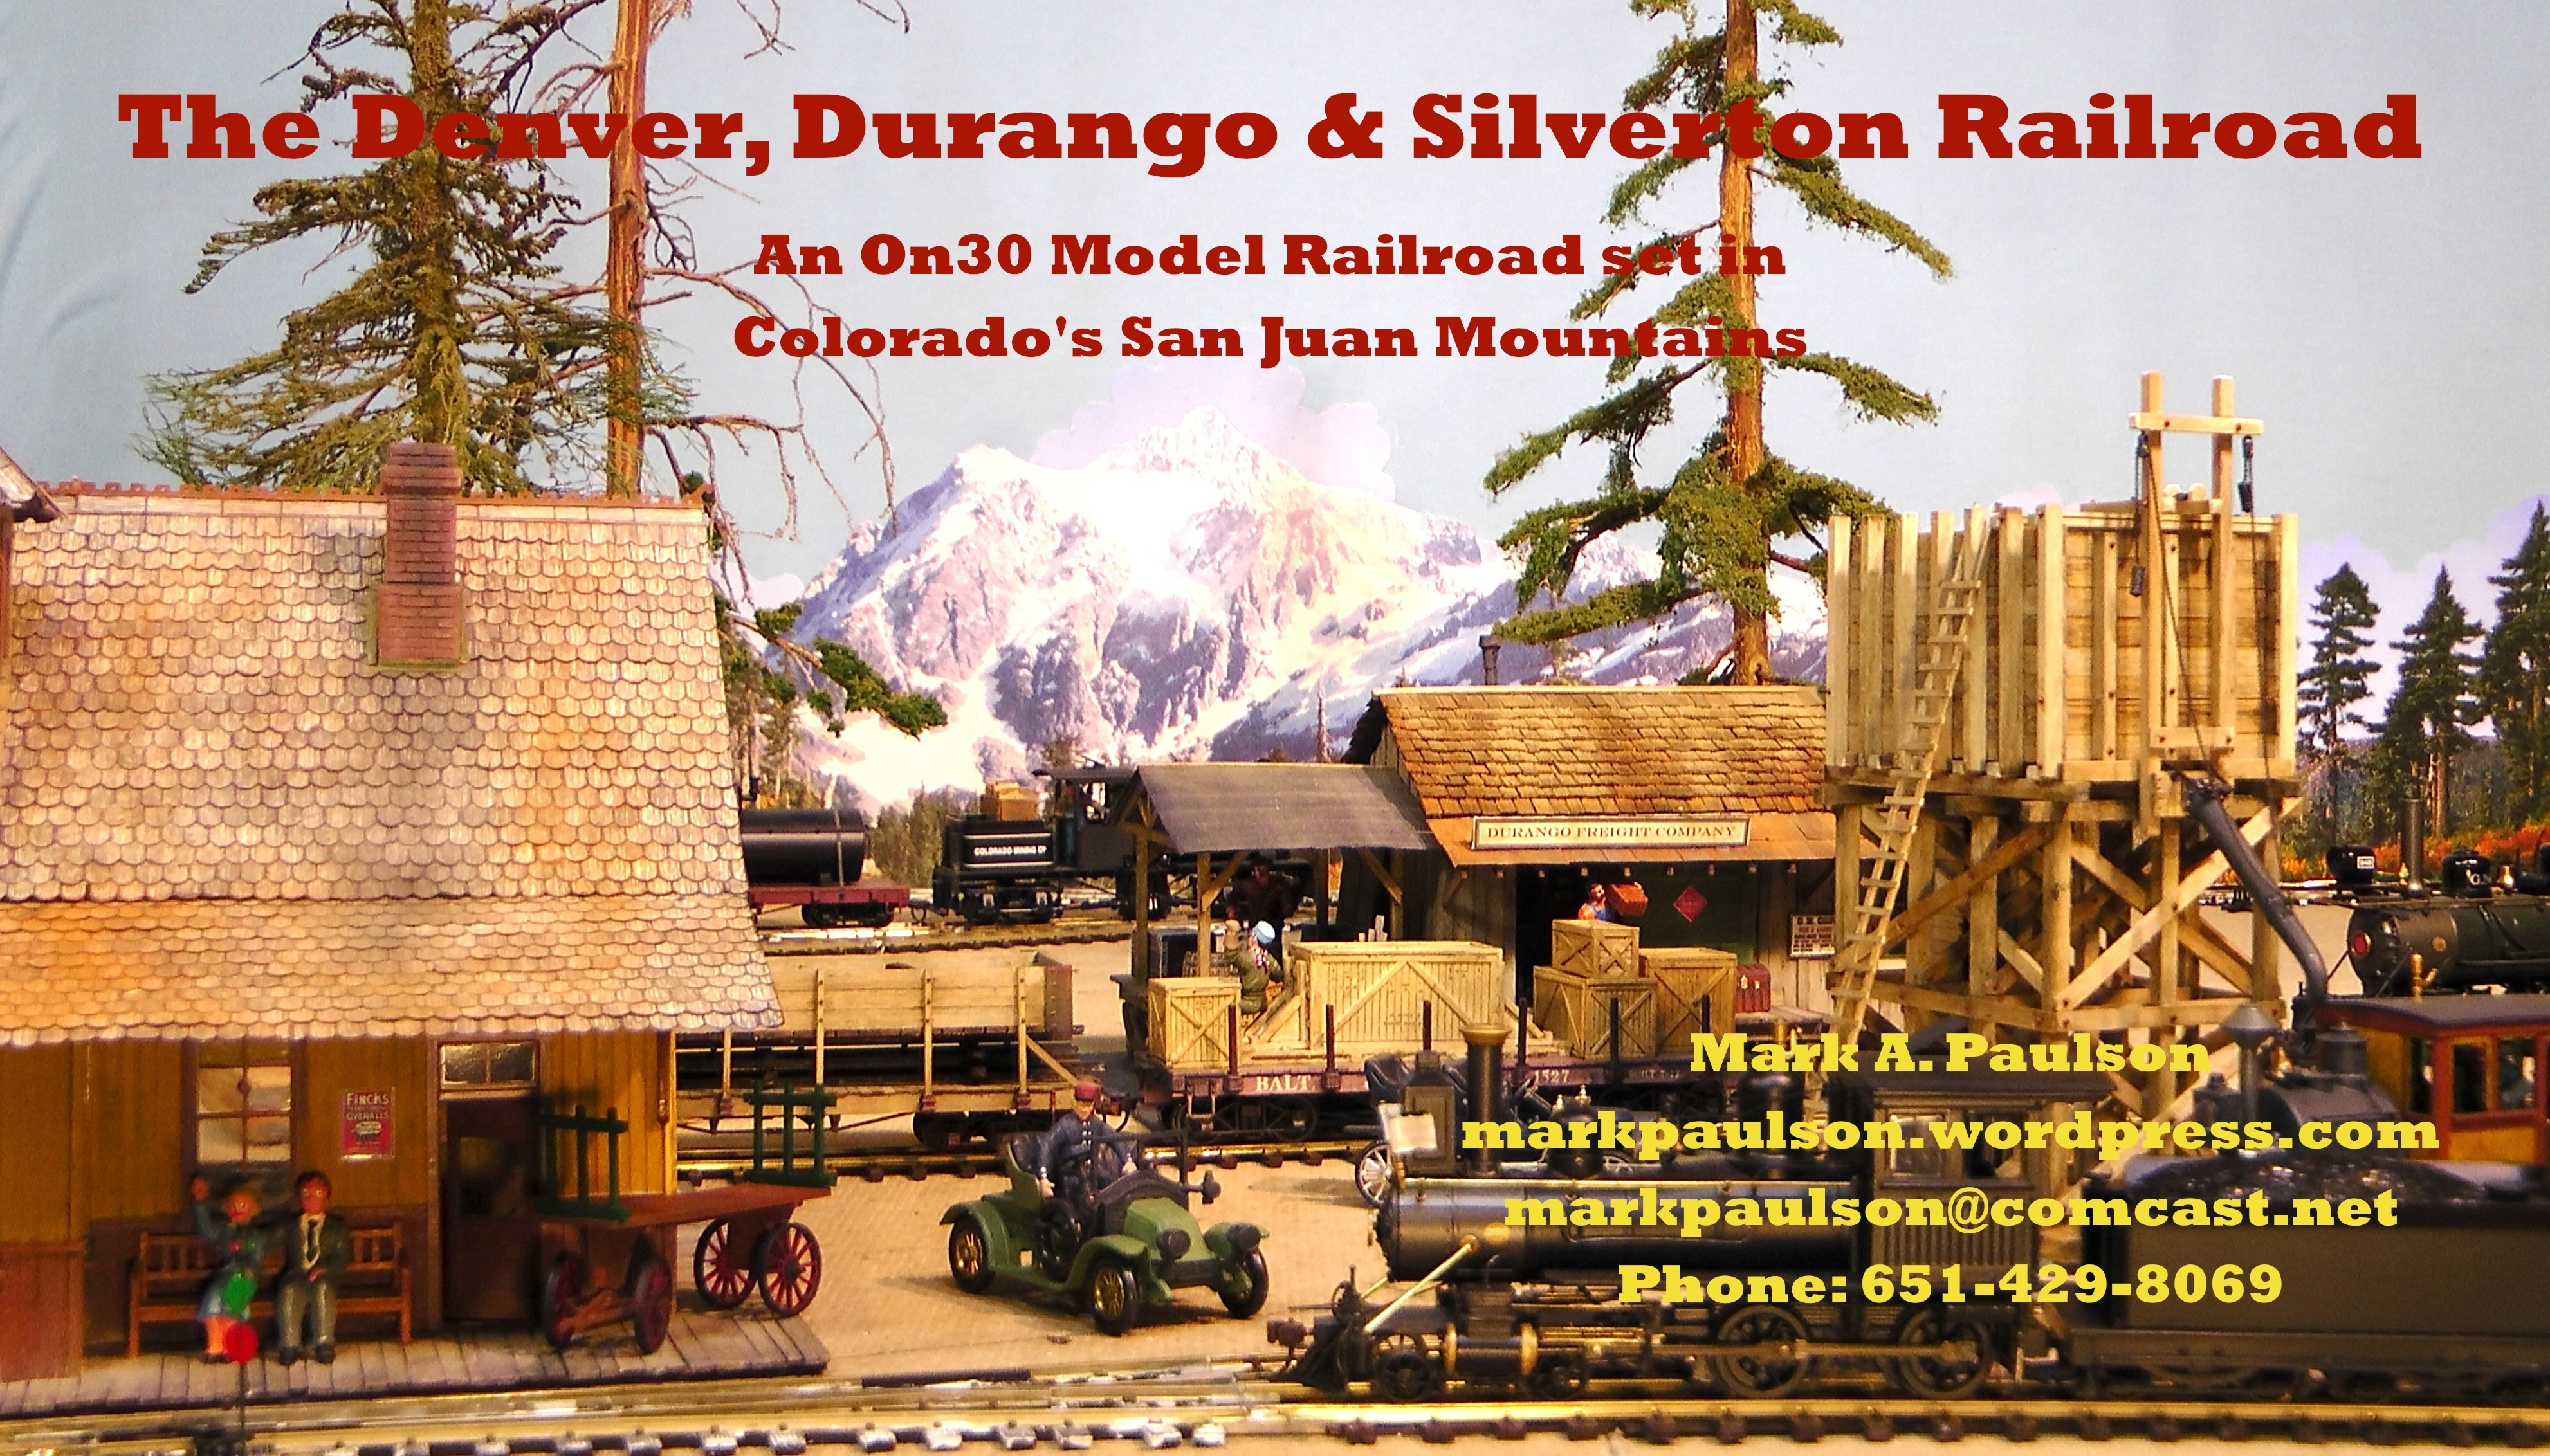 Business Cards   The Denver, Durango & Silverton Railroad